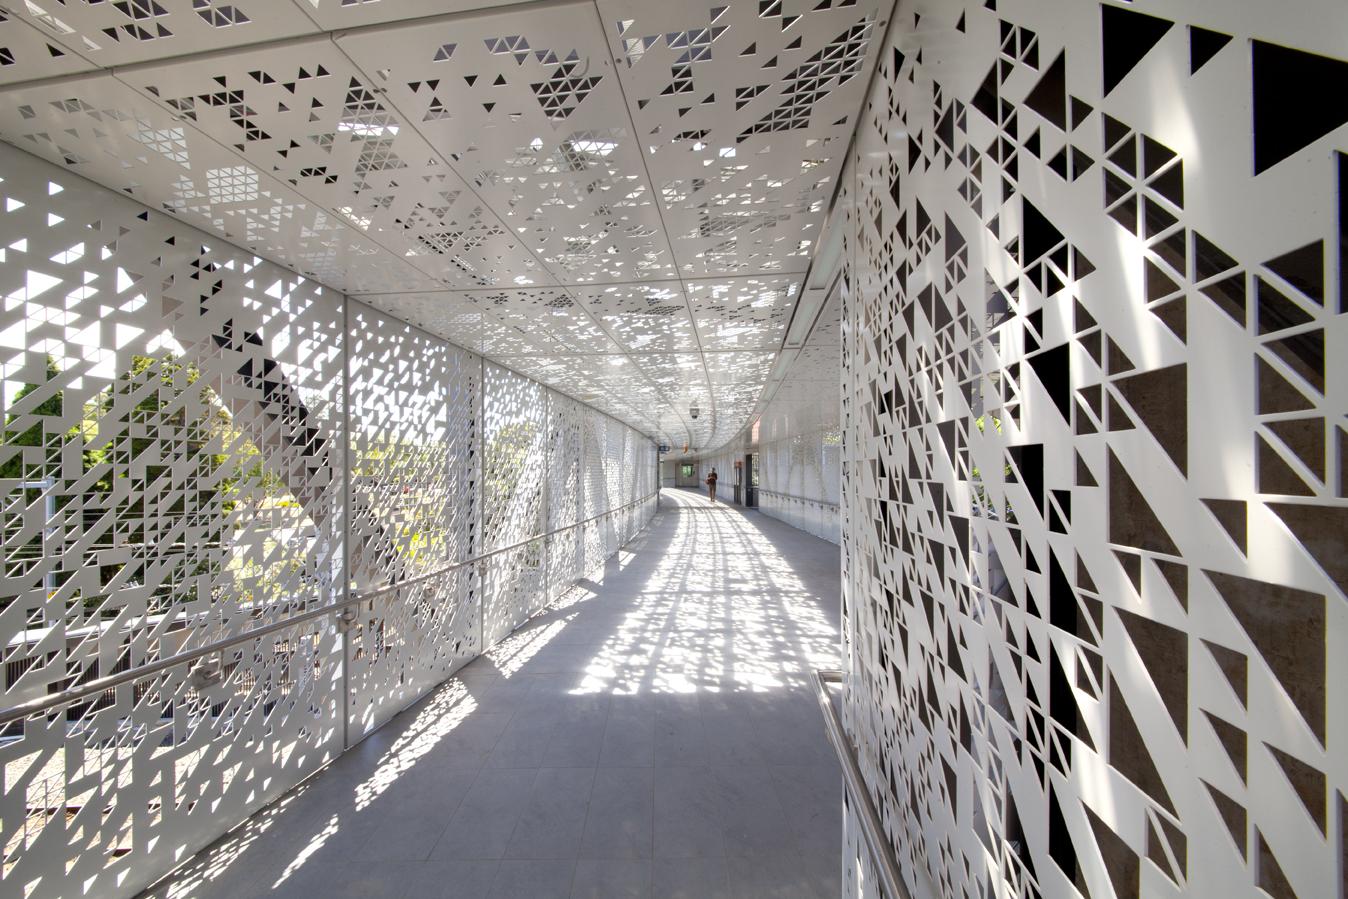 Bespoke perforated metal design - Oatley Station